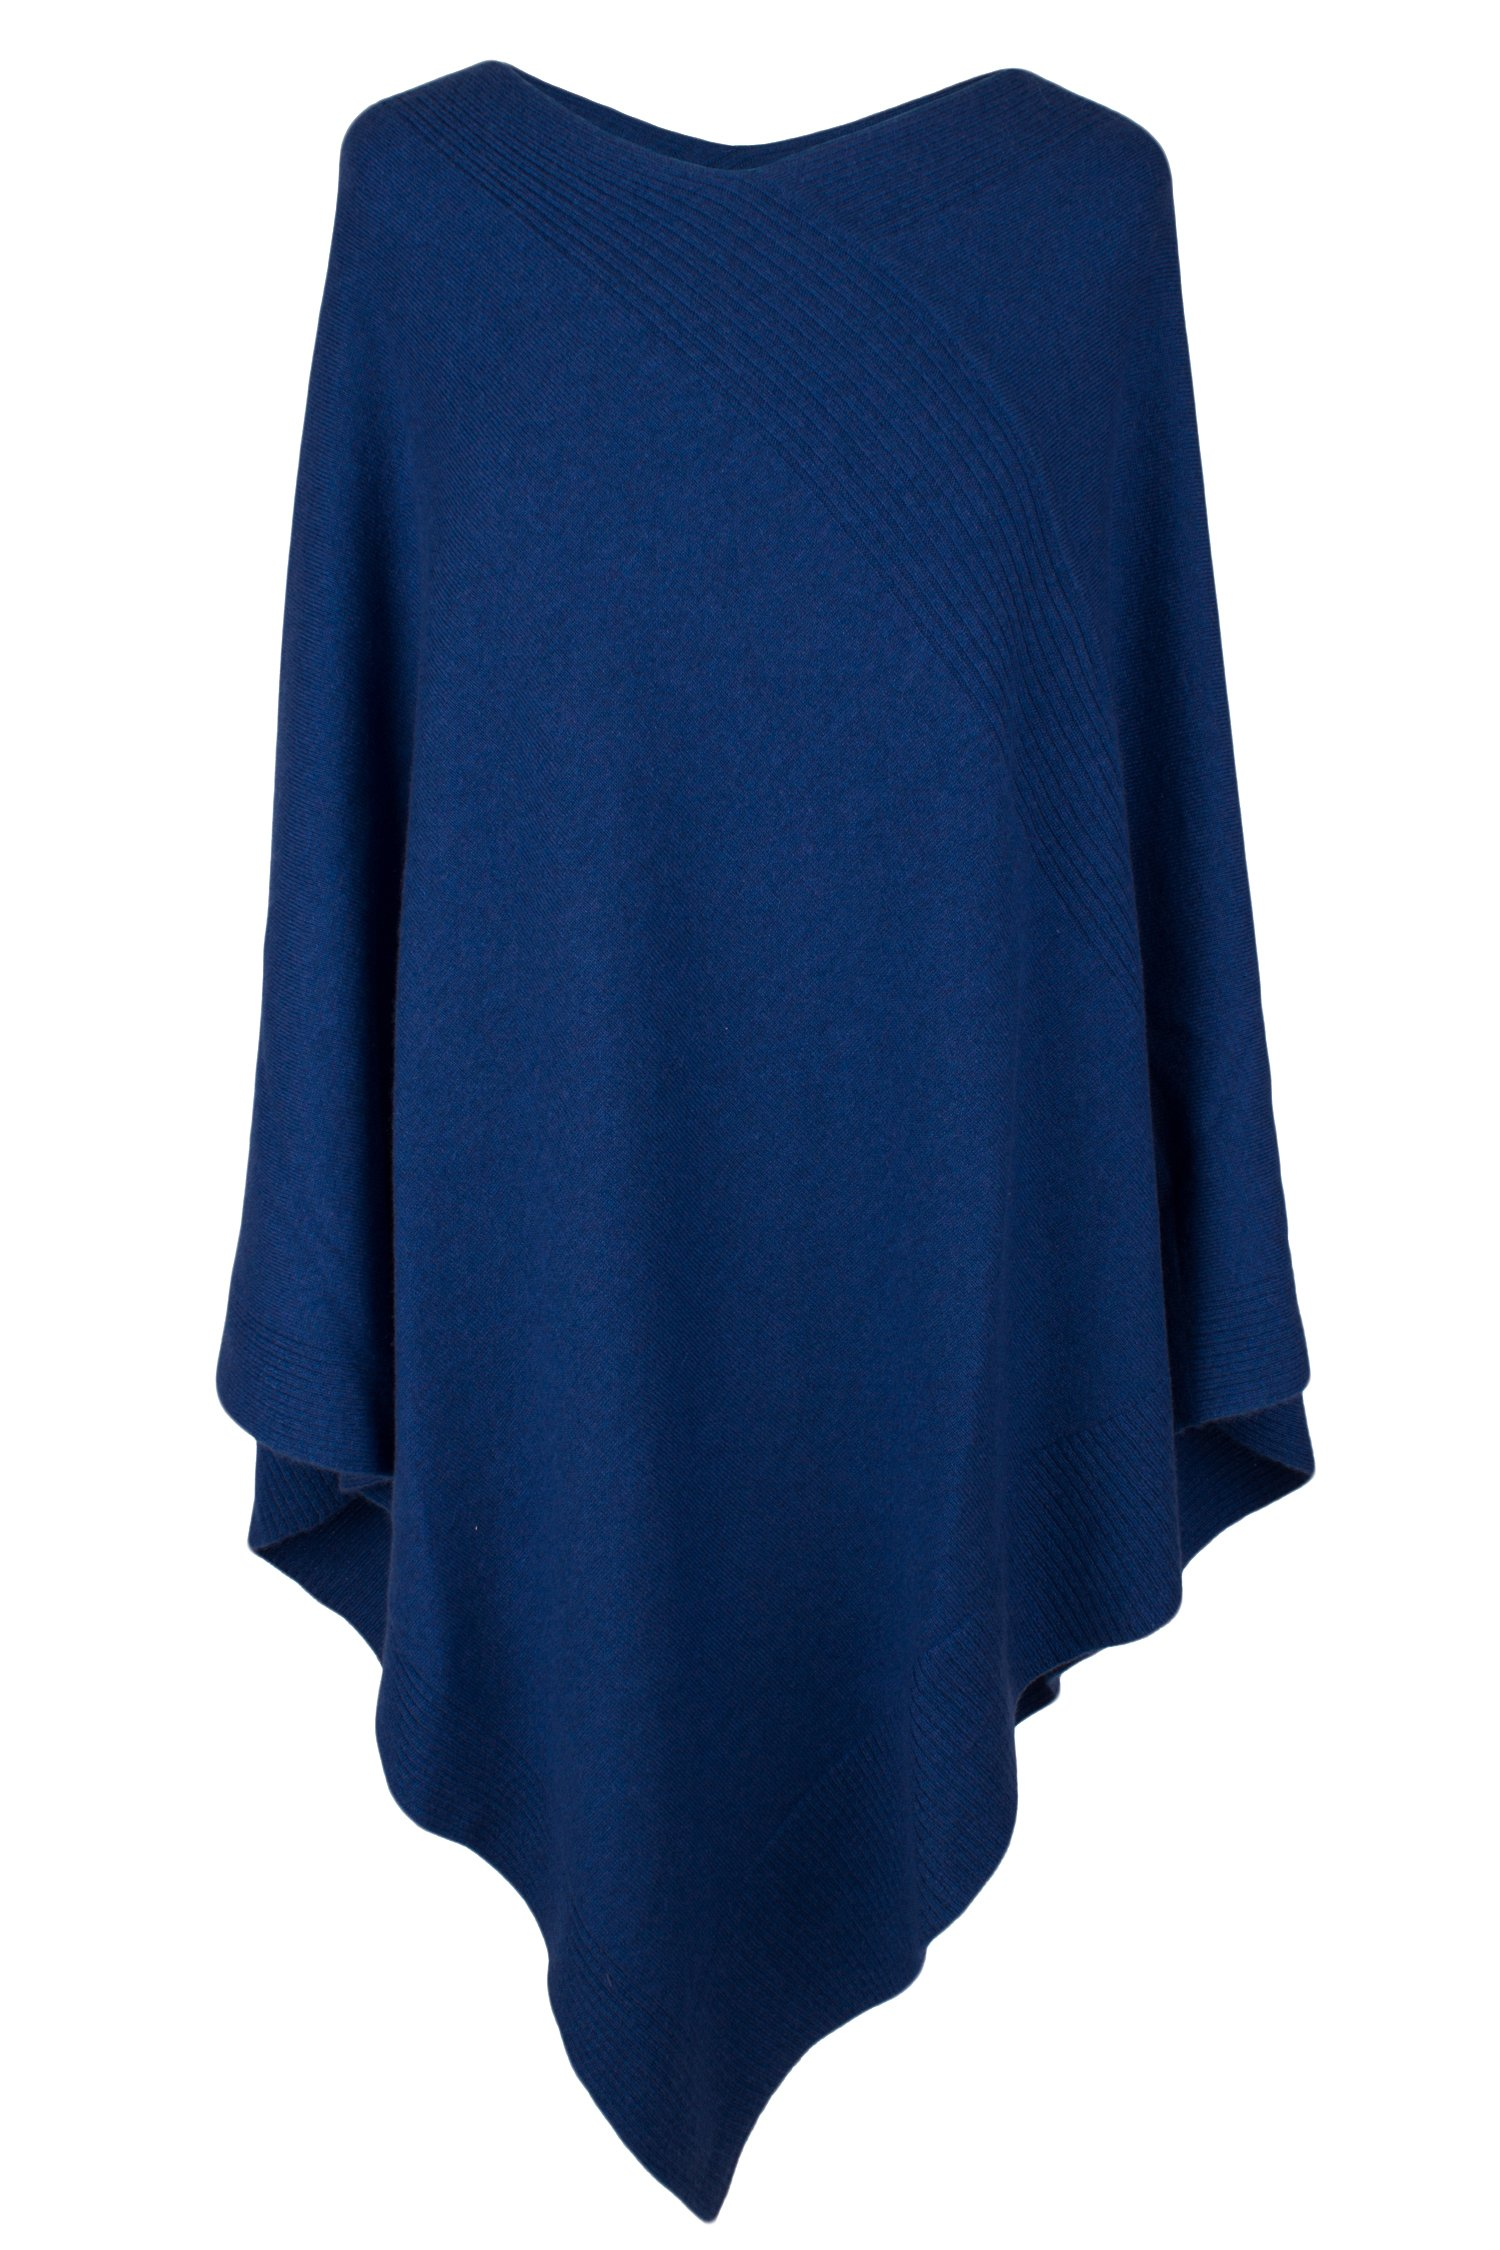 Love Cashmere Women's 100% Cashmere Poncho - Denim Blue - Made In Scotland RRP $600